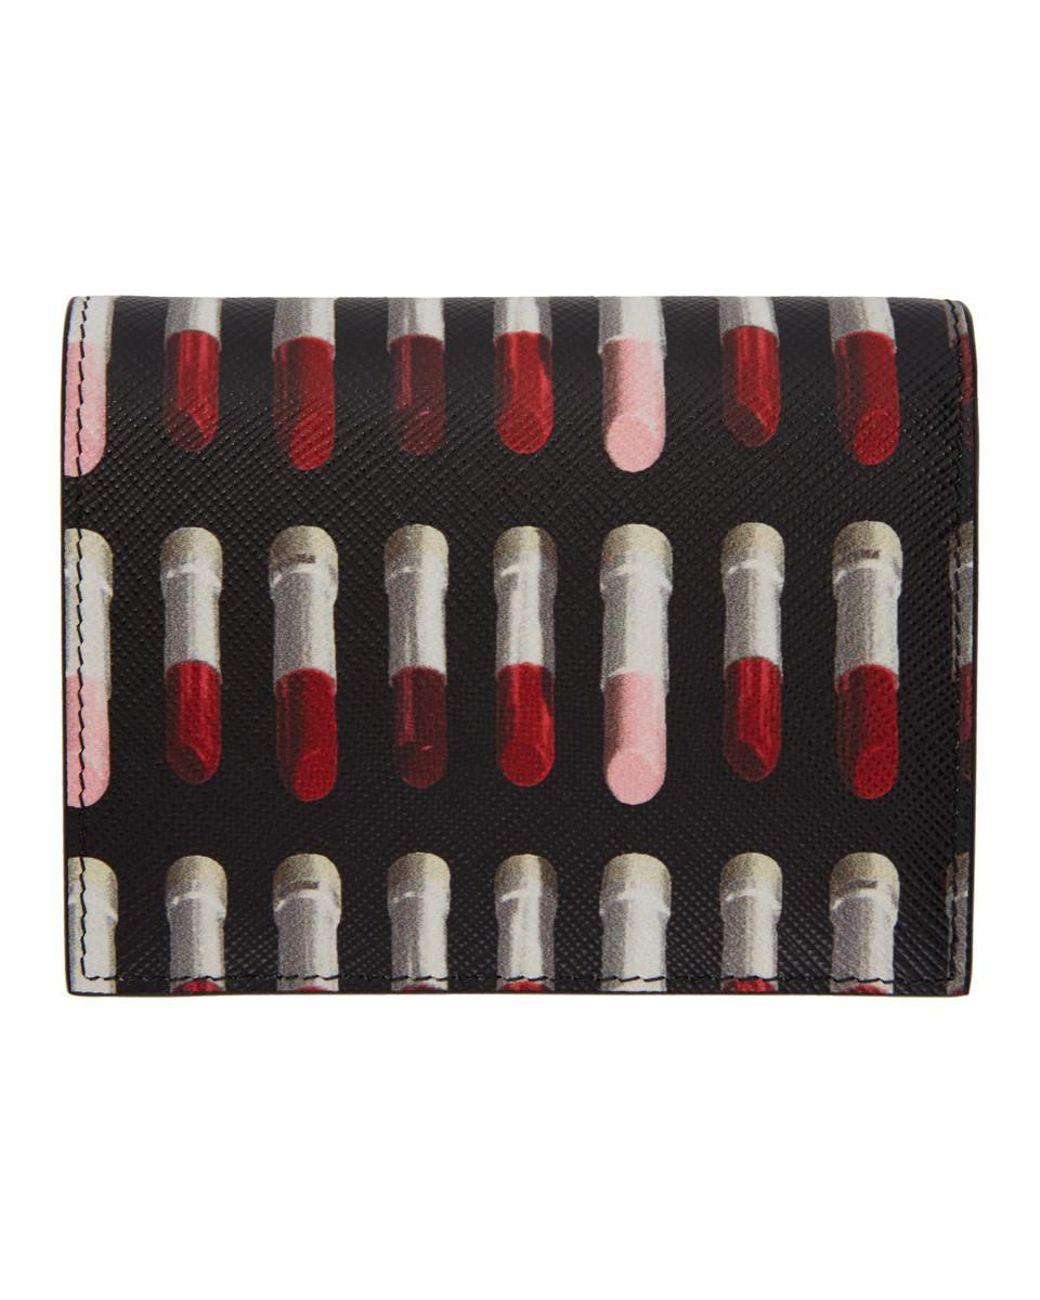 bfd661552824 Prada Black Saffiano Lipstick French Wallet in Black - Save 12% - Lyst